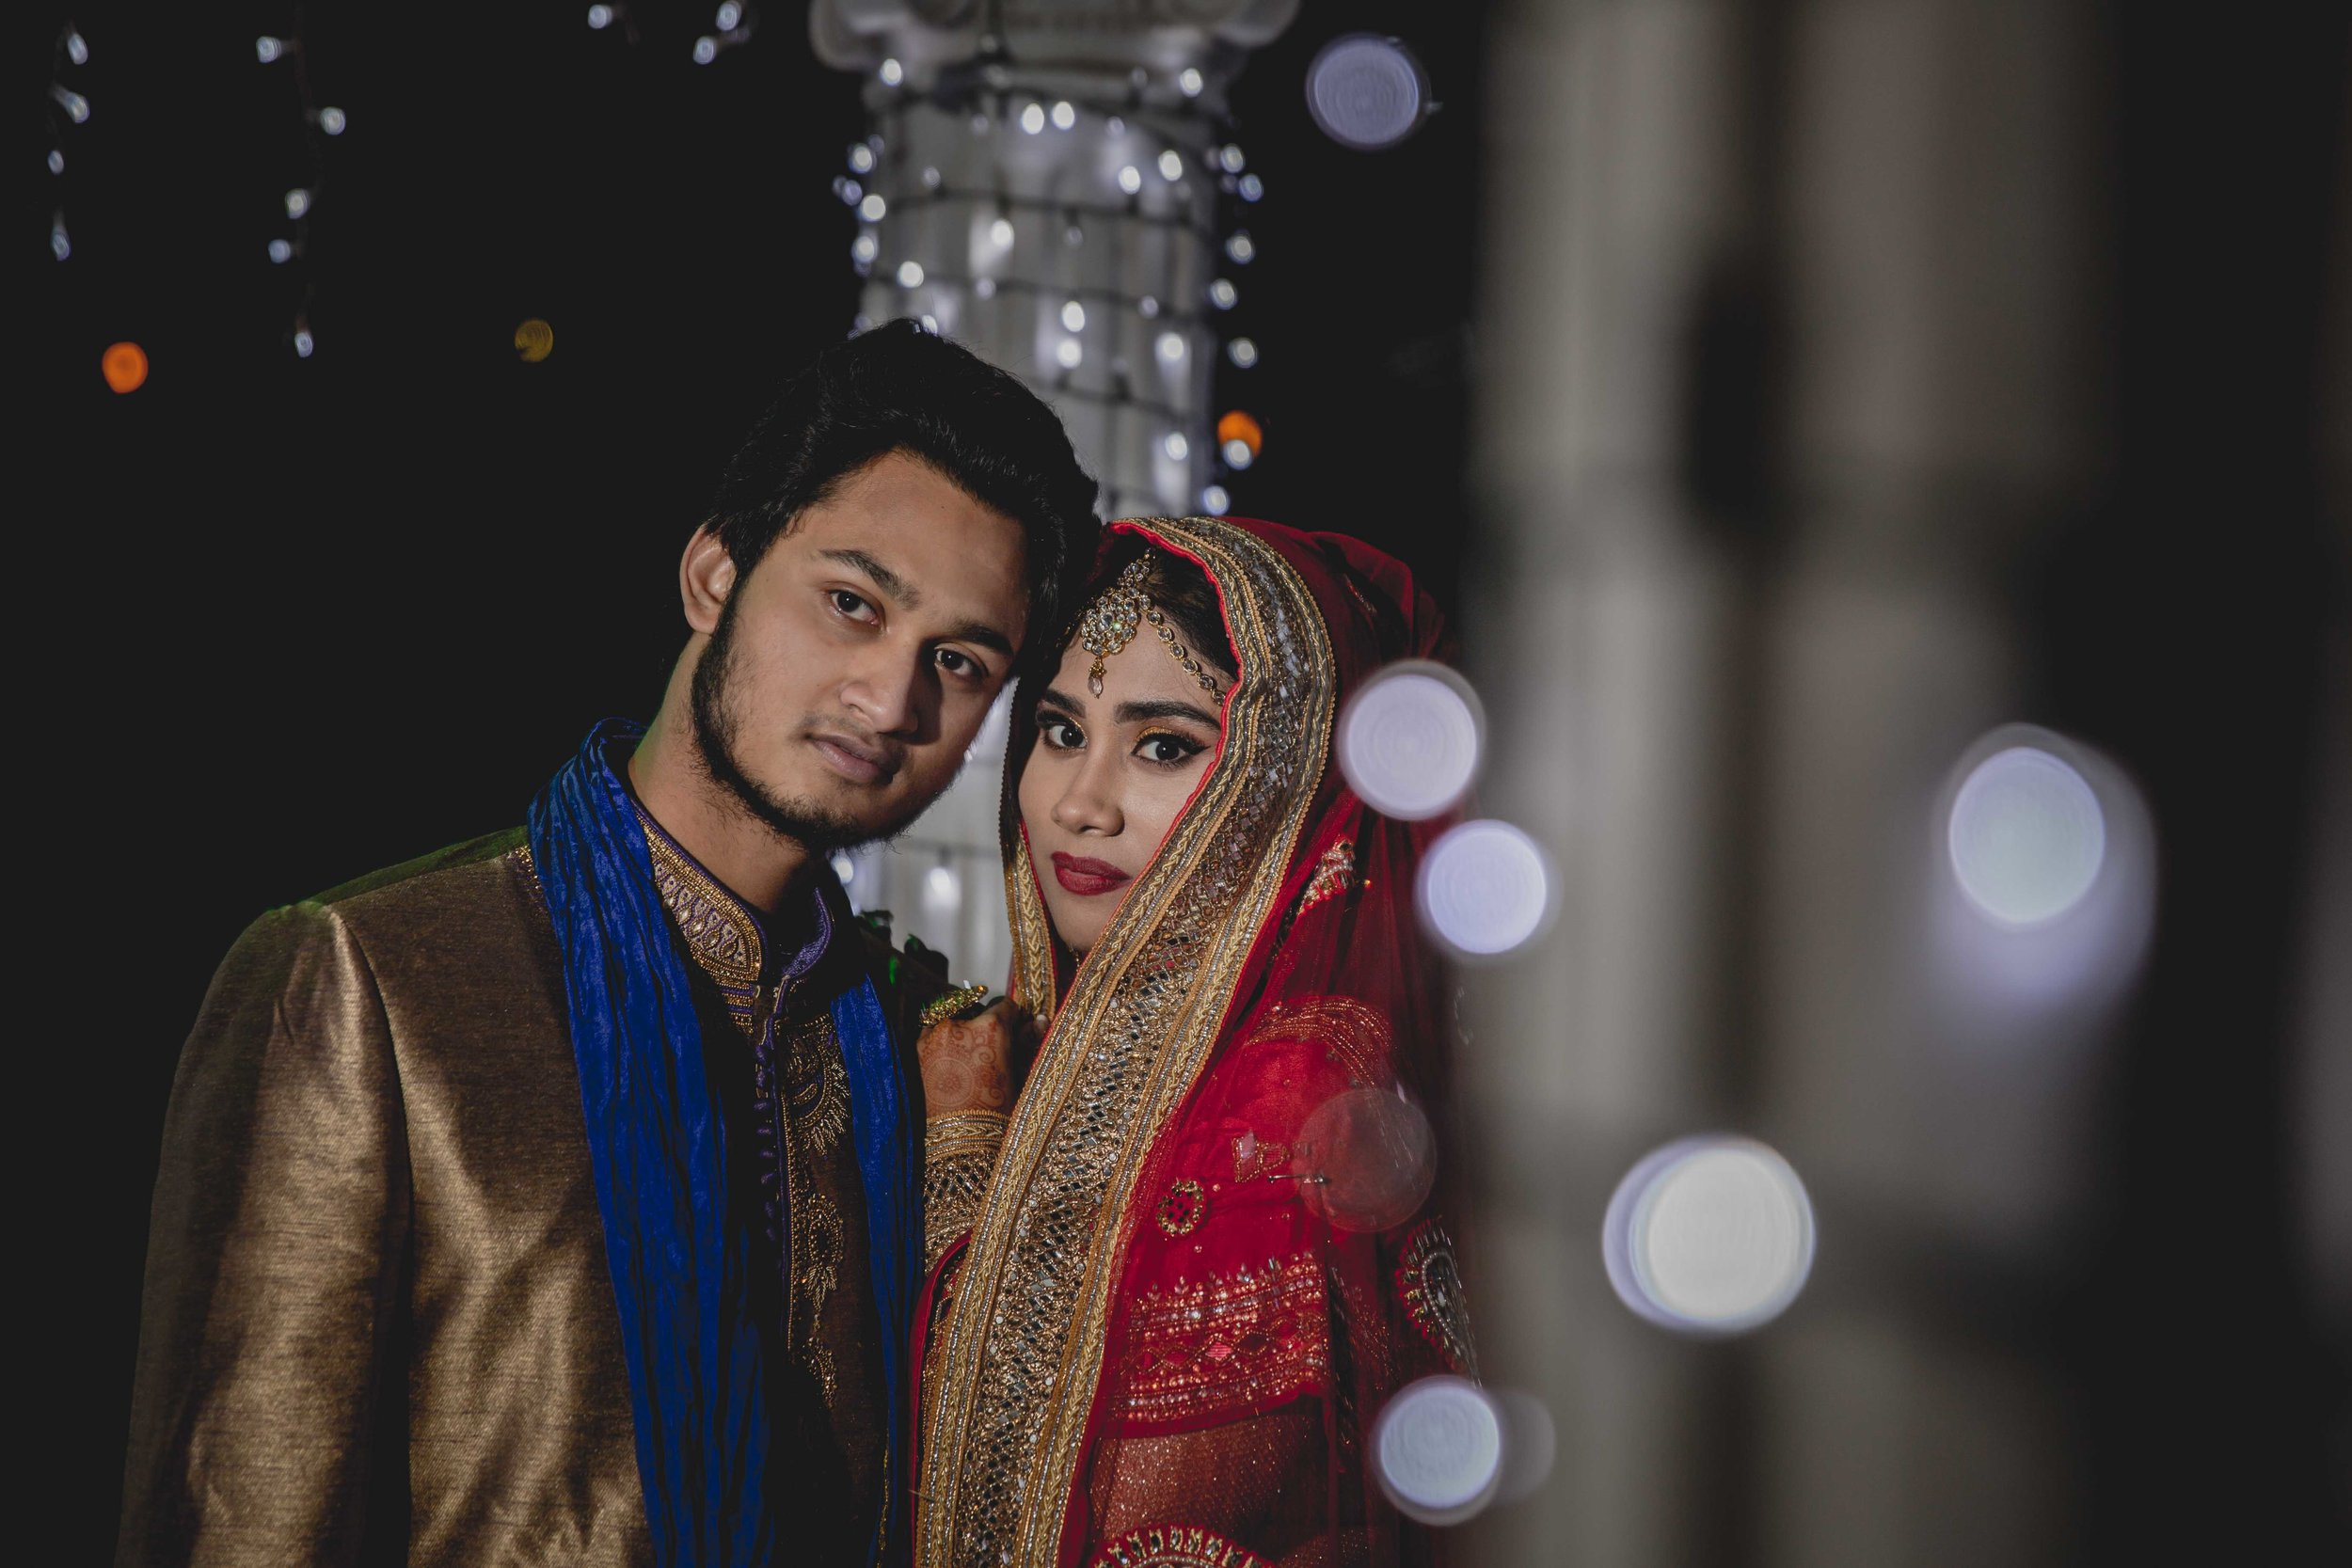 Female-wedding-photographer-birmingham-muslim-wedding-natalia-smith-photography-24.jpg